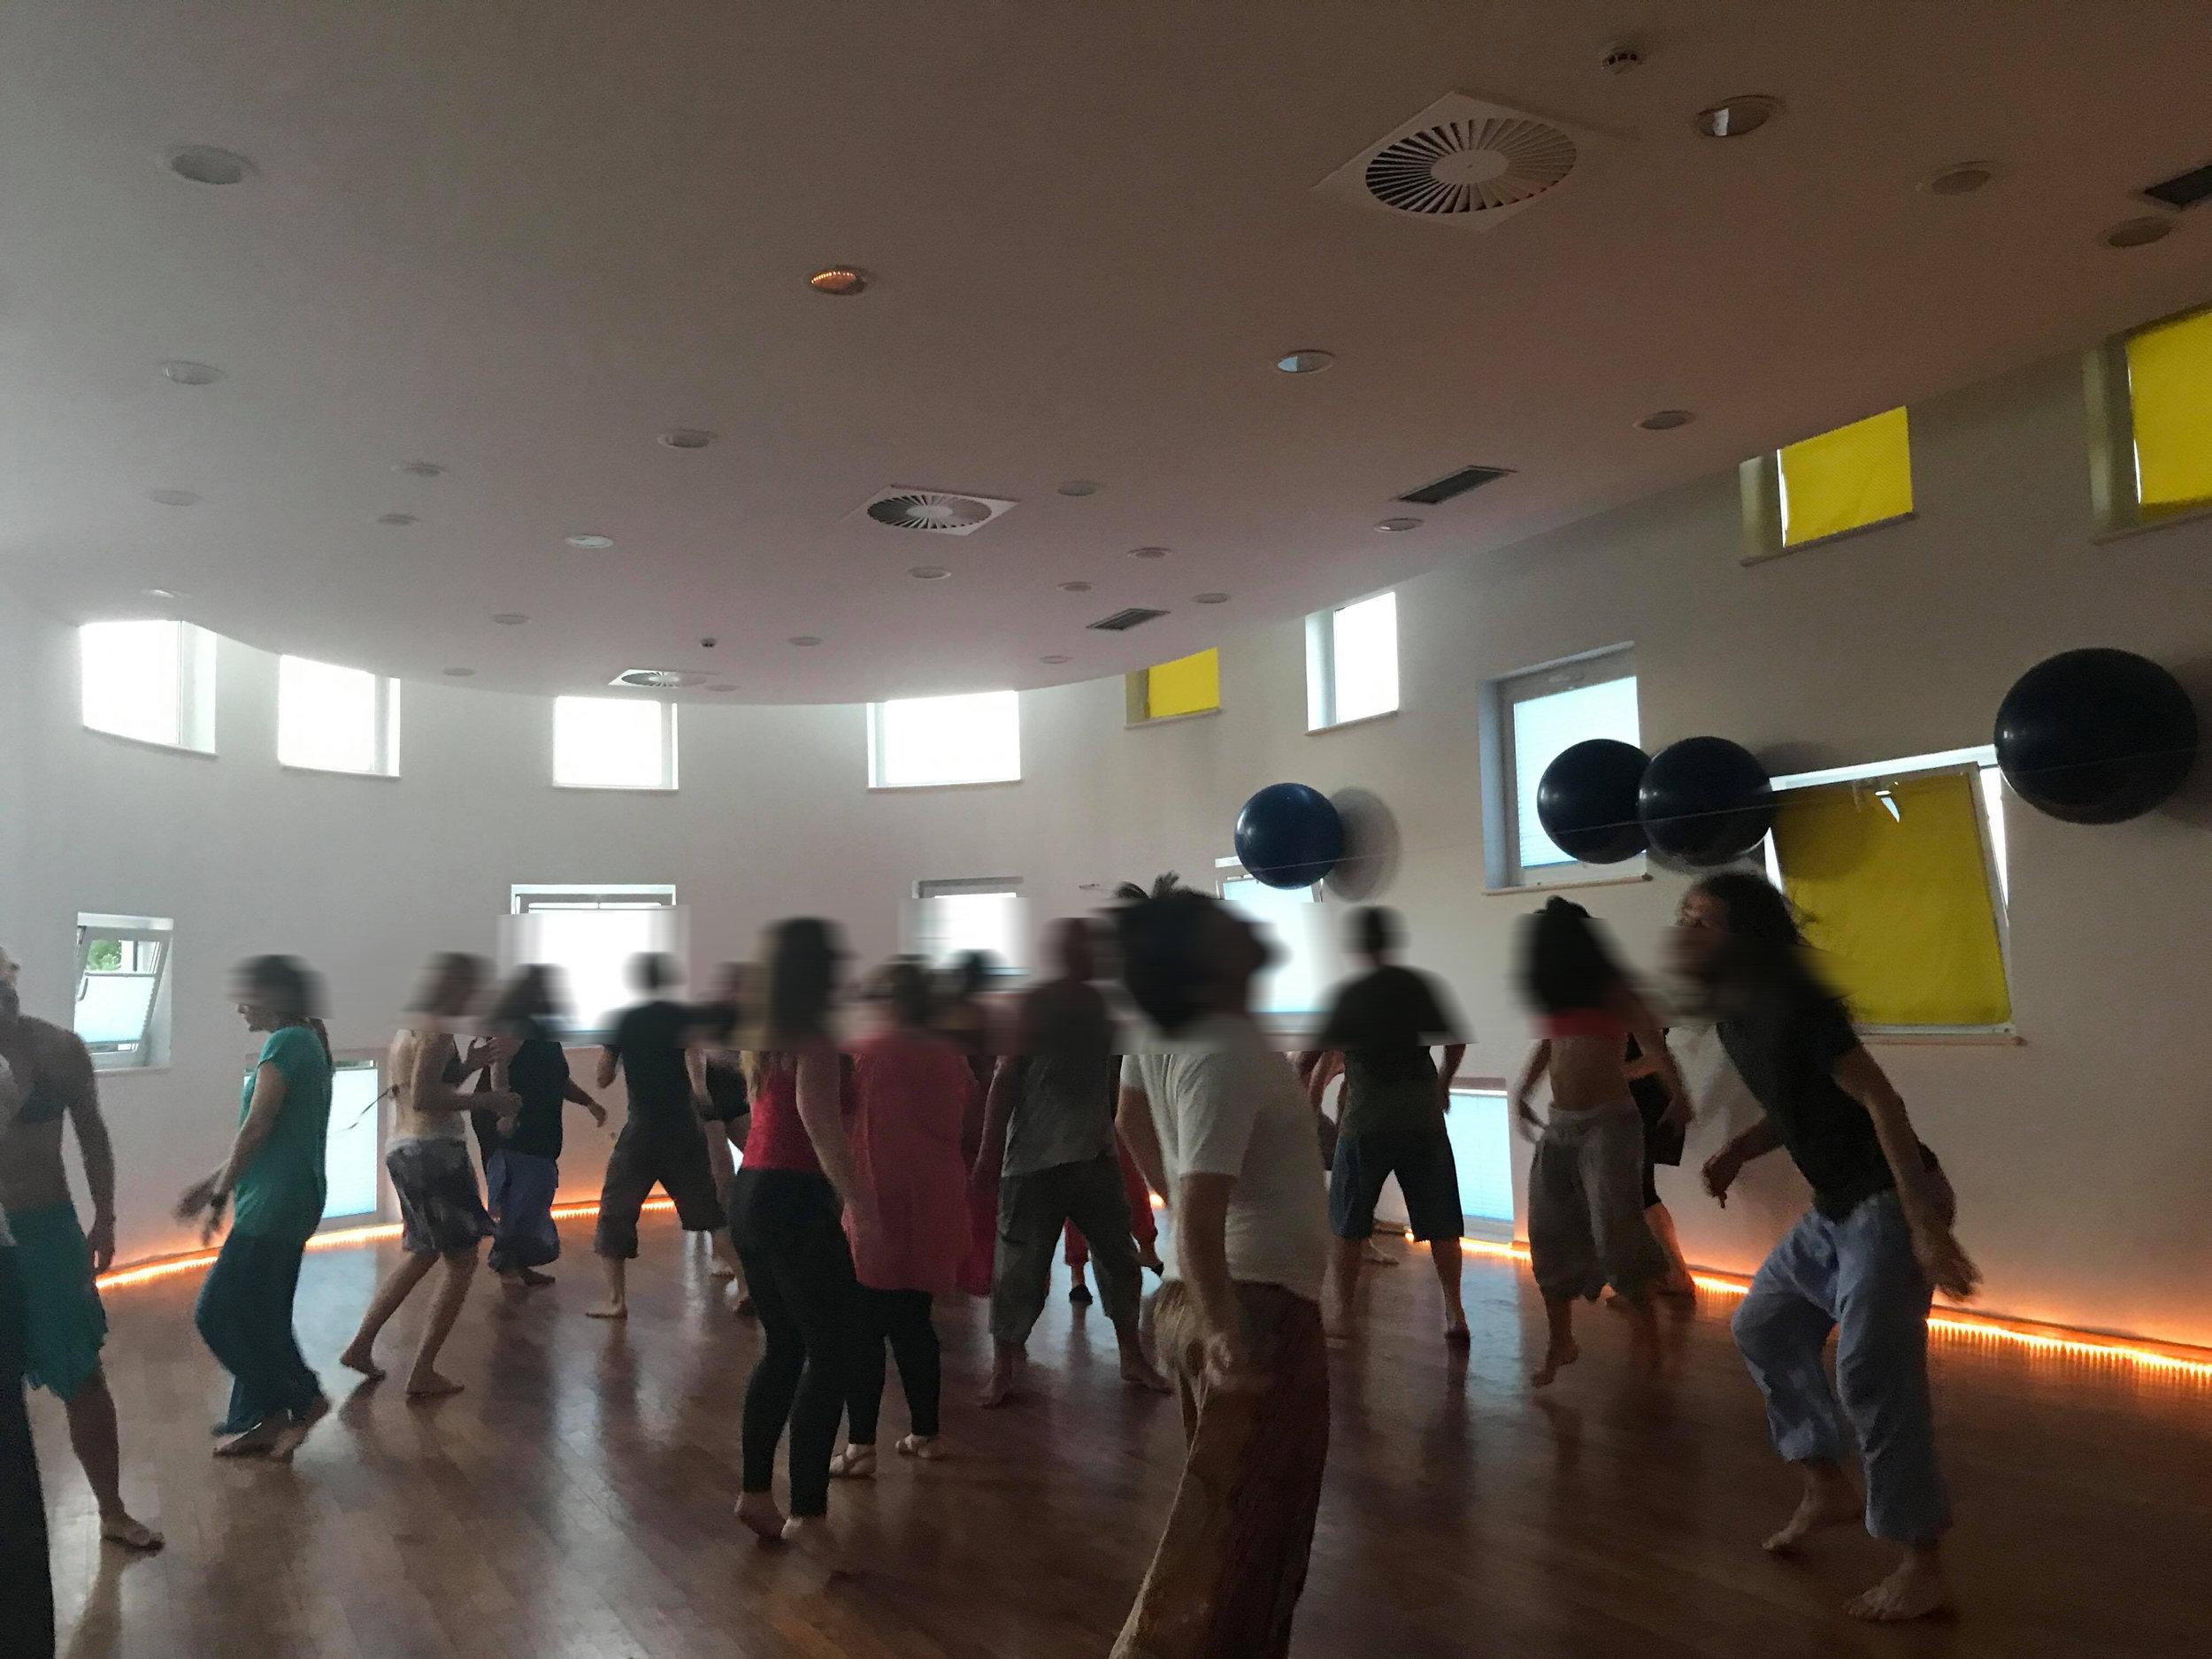 soul flight promo dance space 3 blur.jpg